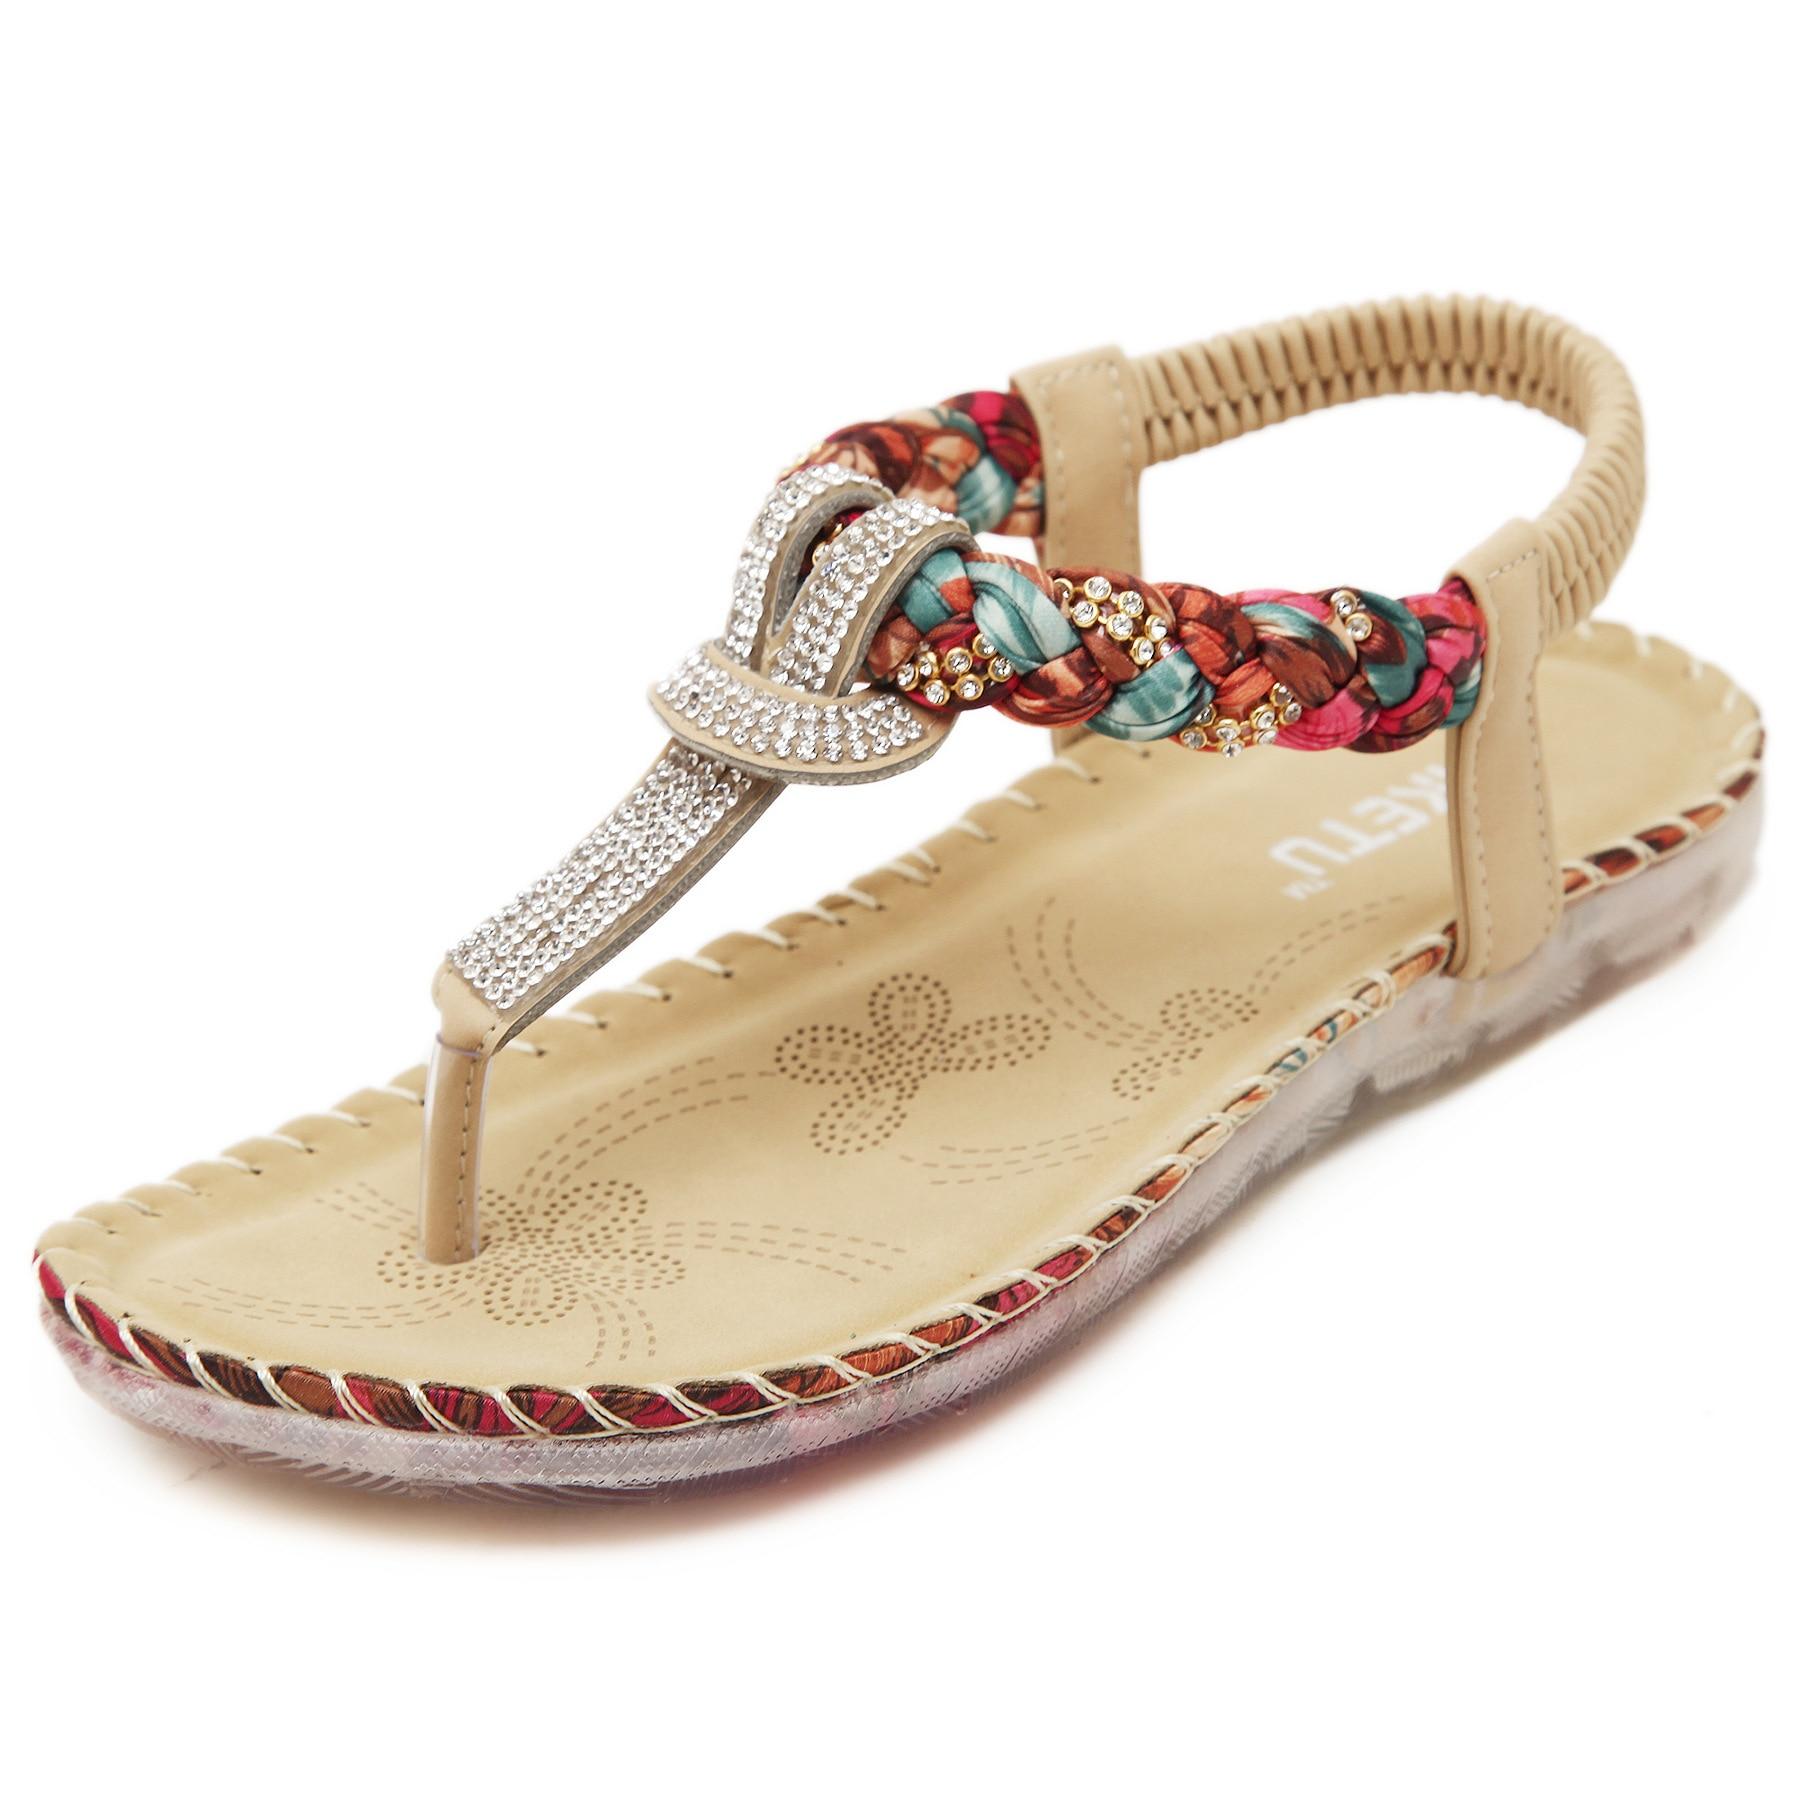 KUYUPP Bohemian Sandals Women Diamond Ankle Slingback Nubuck Leather Flats Flip Flops Shoes Summer Beach Sandals SDT538 kuyupp fashion leather women sandals bohemian diamond slippers woman flats flip flops shoes summer beach sandals size10 ydt563